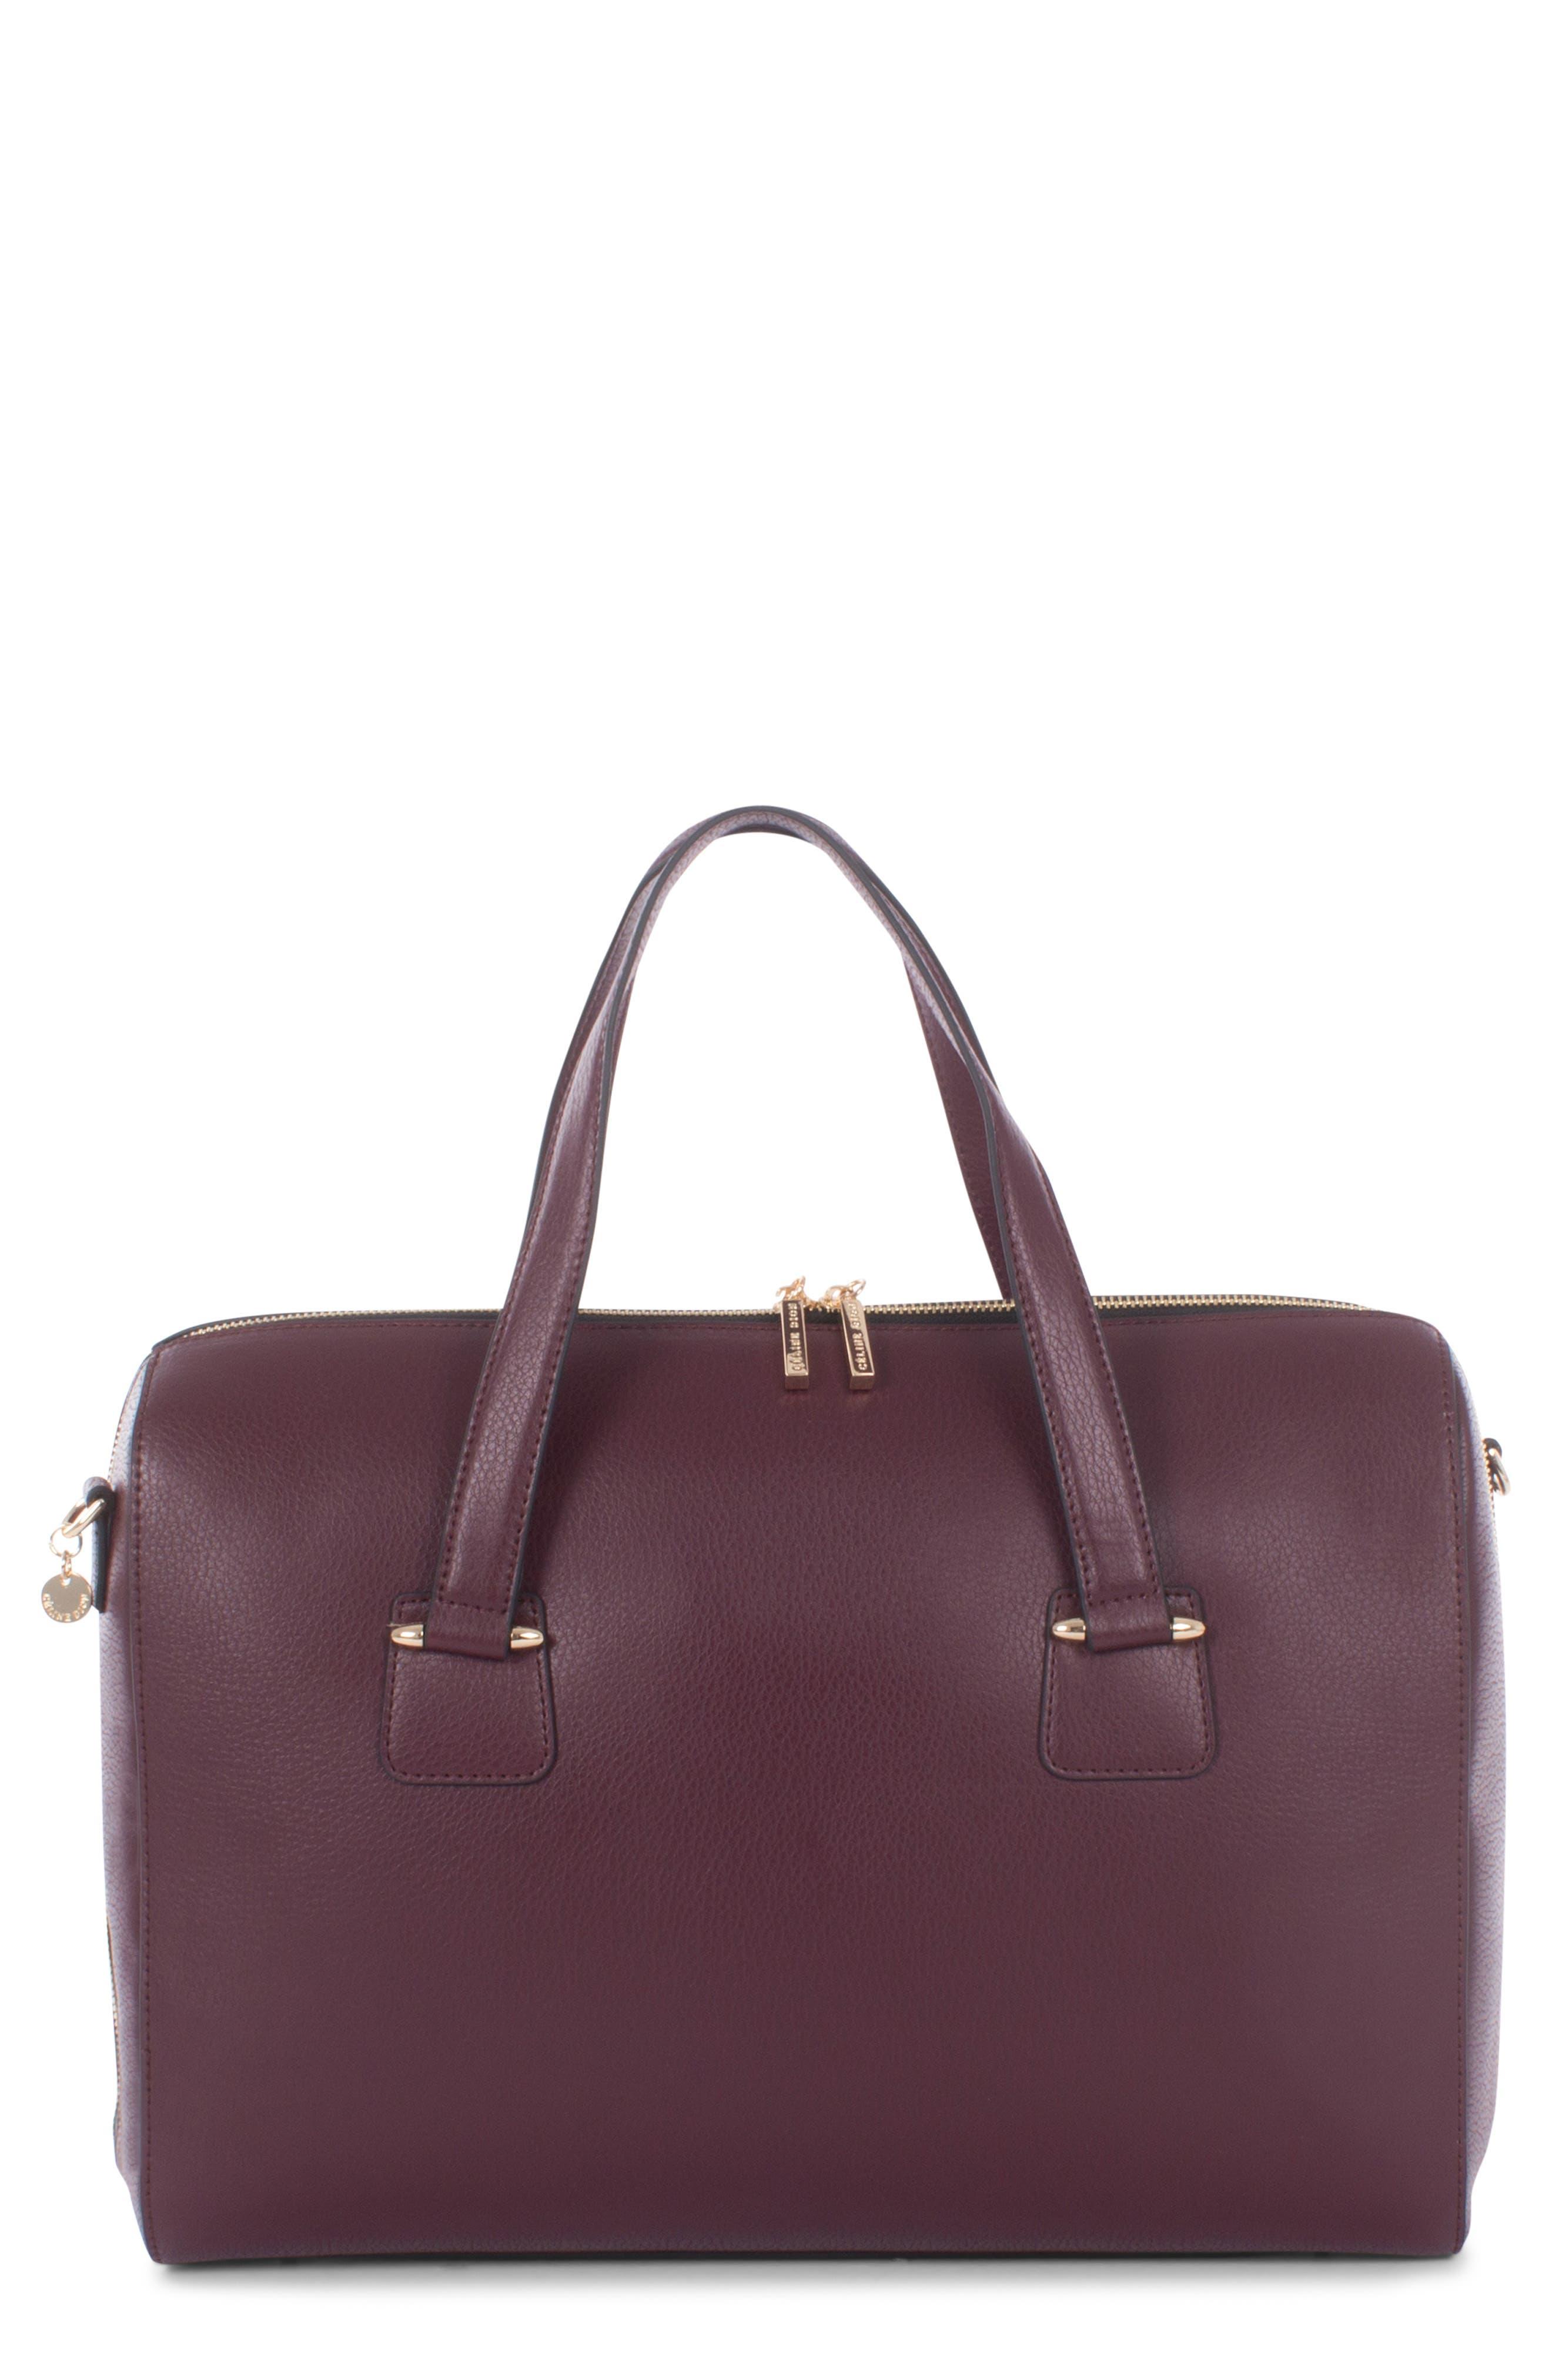 Céline Dion Triad Leather Satchel,                         Main,                         color, WINTER WINE